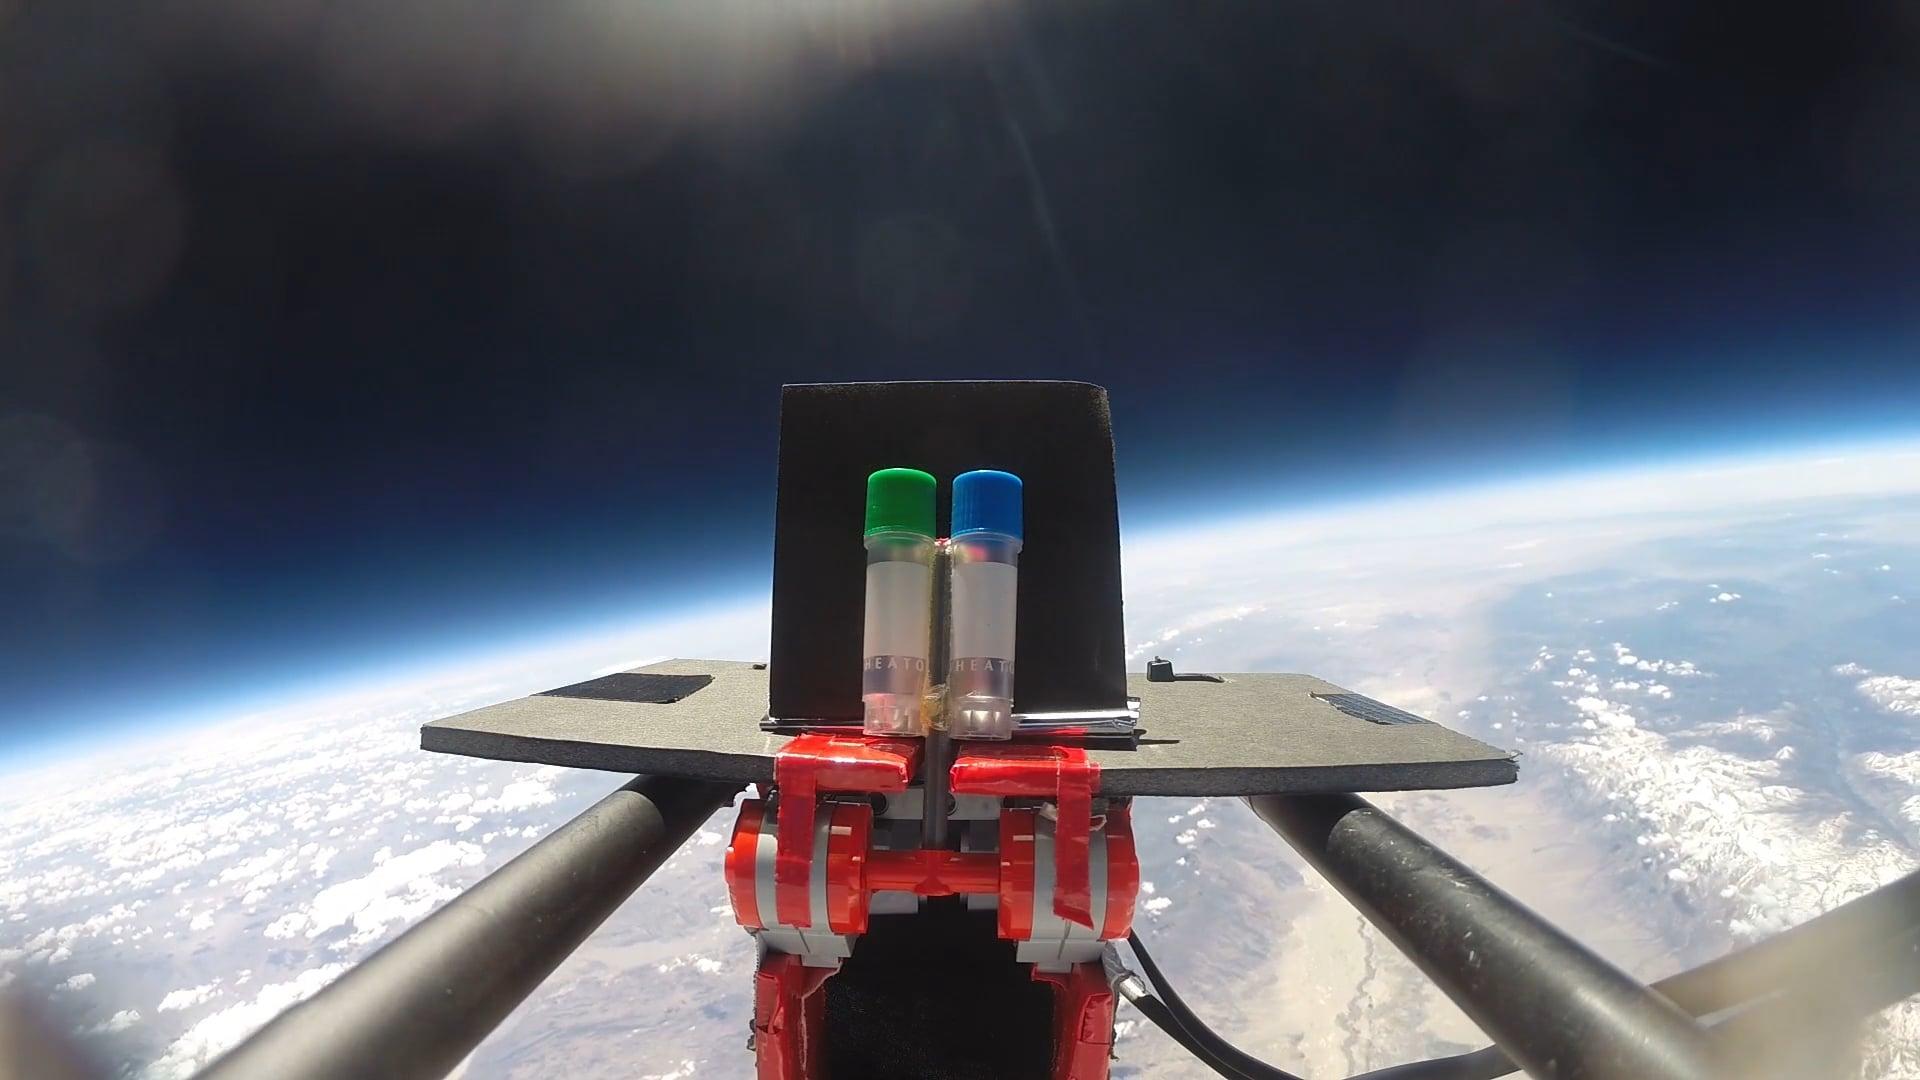 Aerobiology Research Robot